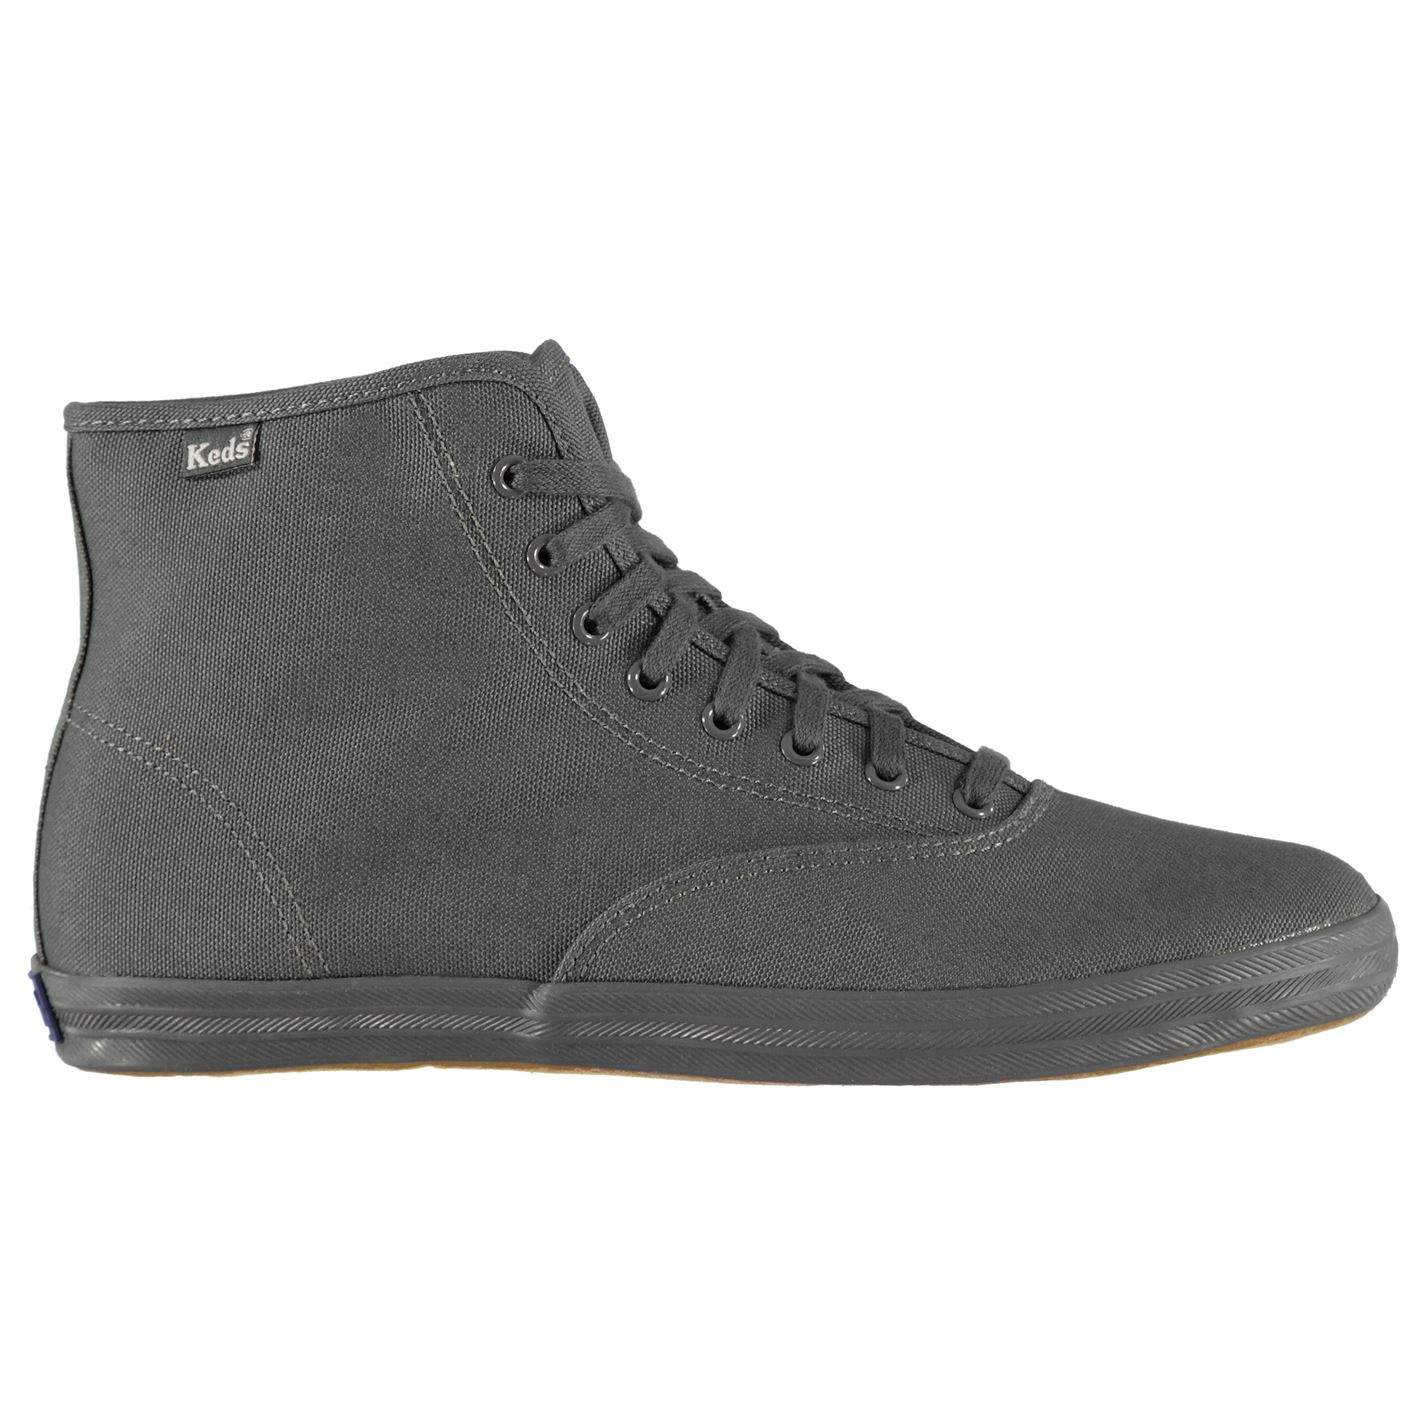 cf5f05e1e42 boty Keds High Canvas Shoes dámské Grey. boty Keds High Canvas Shoes dámské  Grey  boty Keds High Canvas Shoes dámské Grey